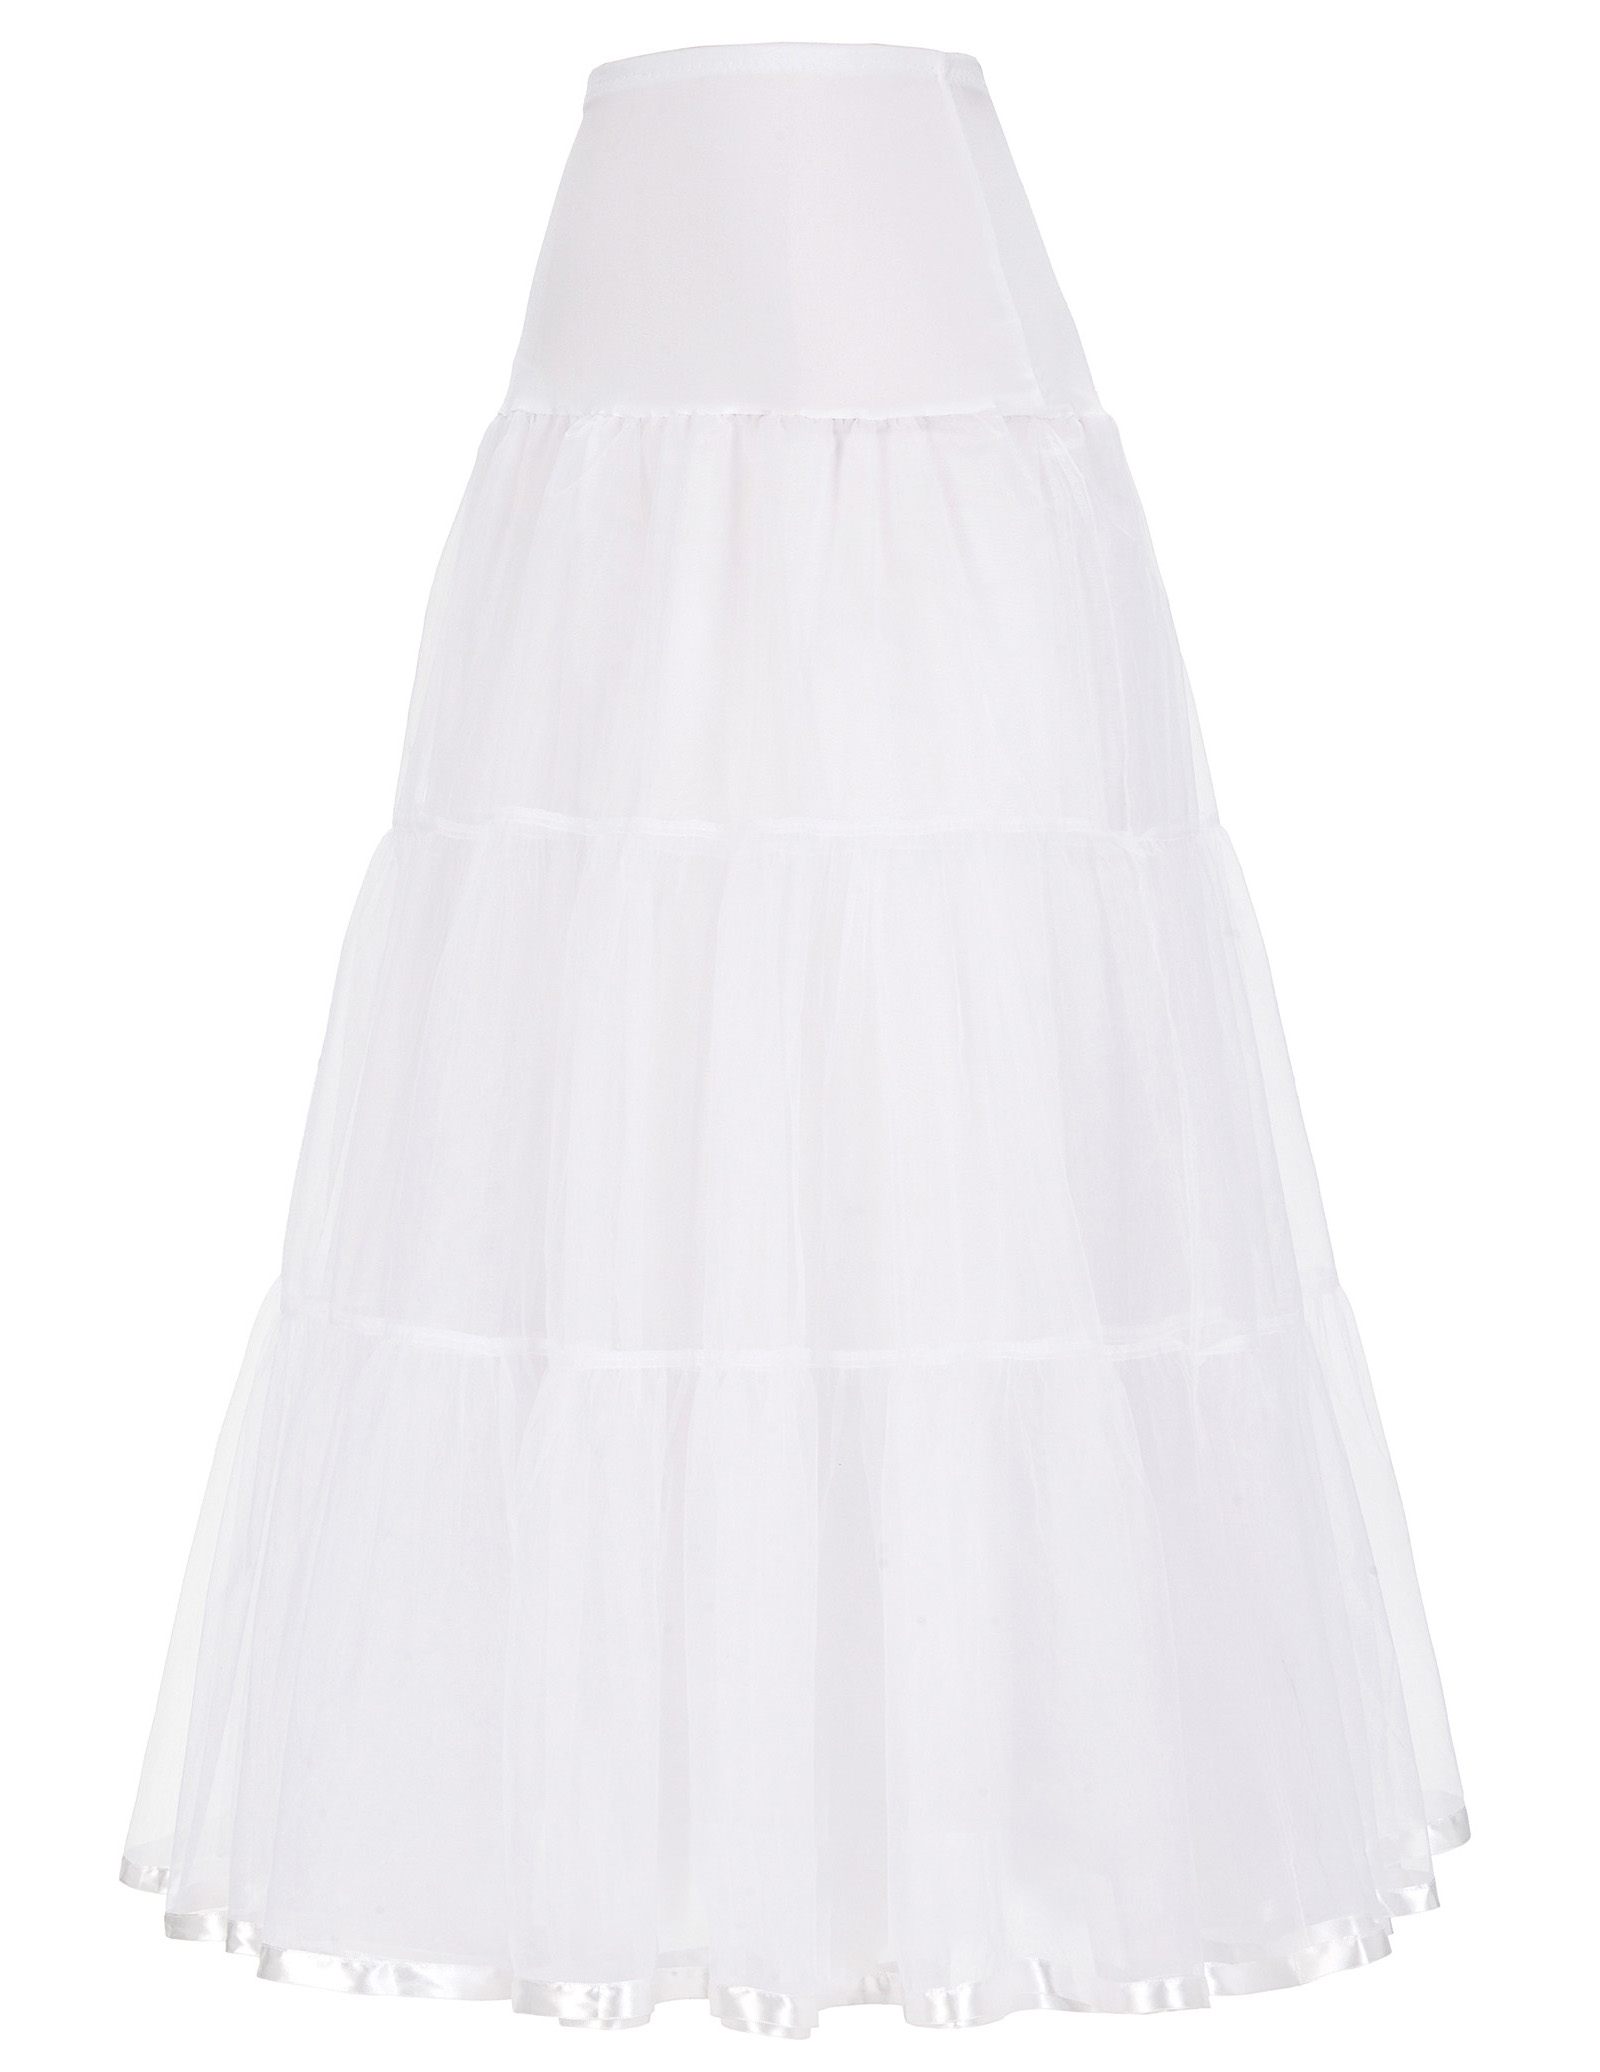 GK vintage skirts Womens Retro solid color pleated shirred decor elastic high waist skirt Crinoline Petticoat Underskirt female